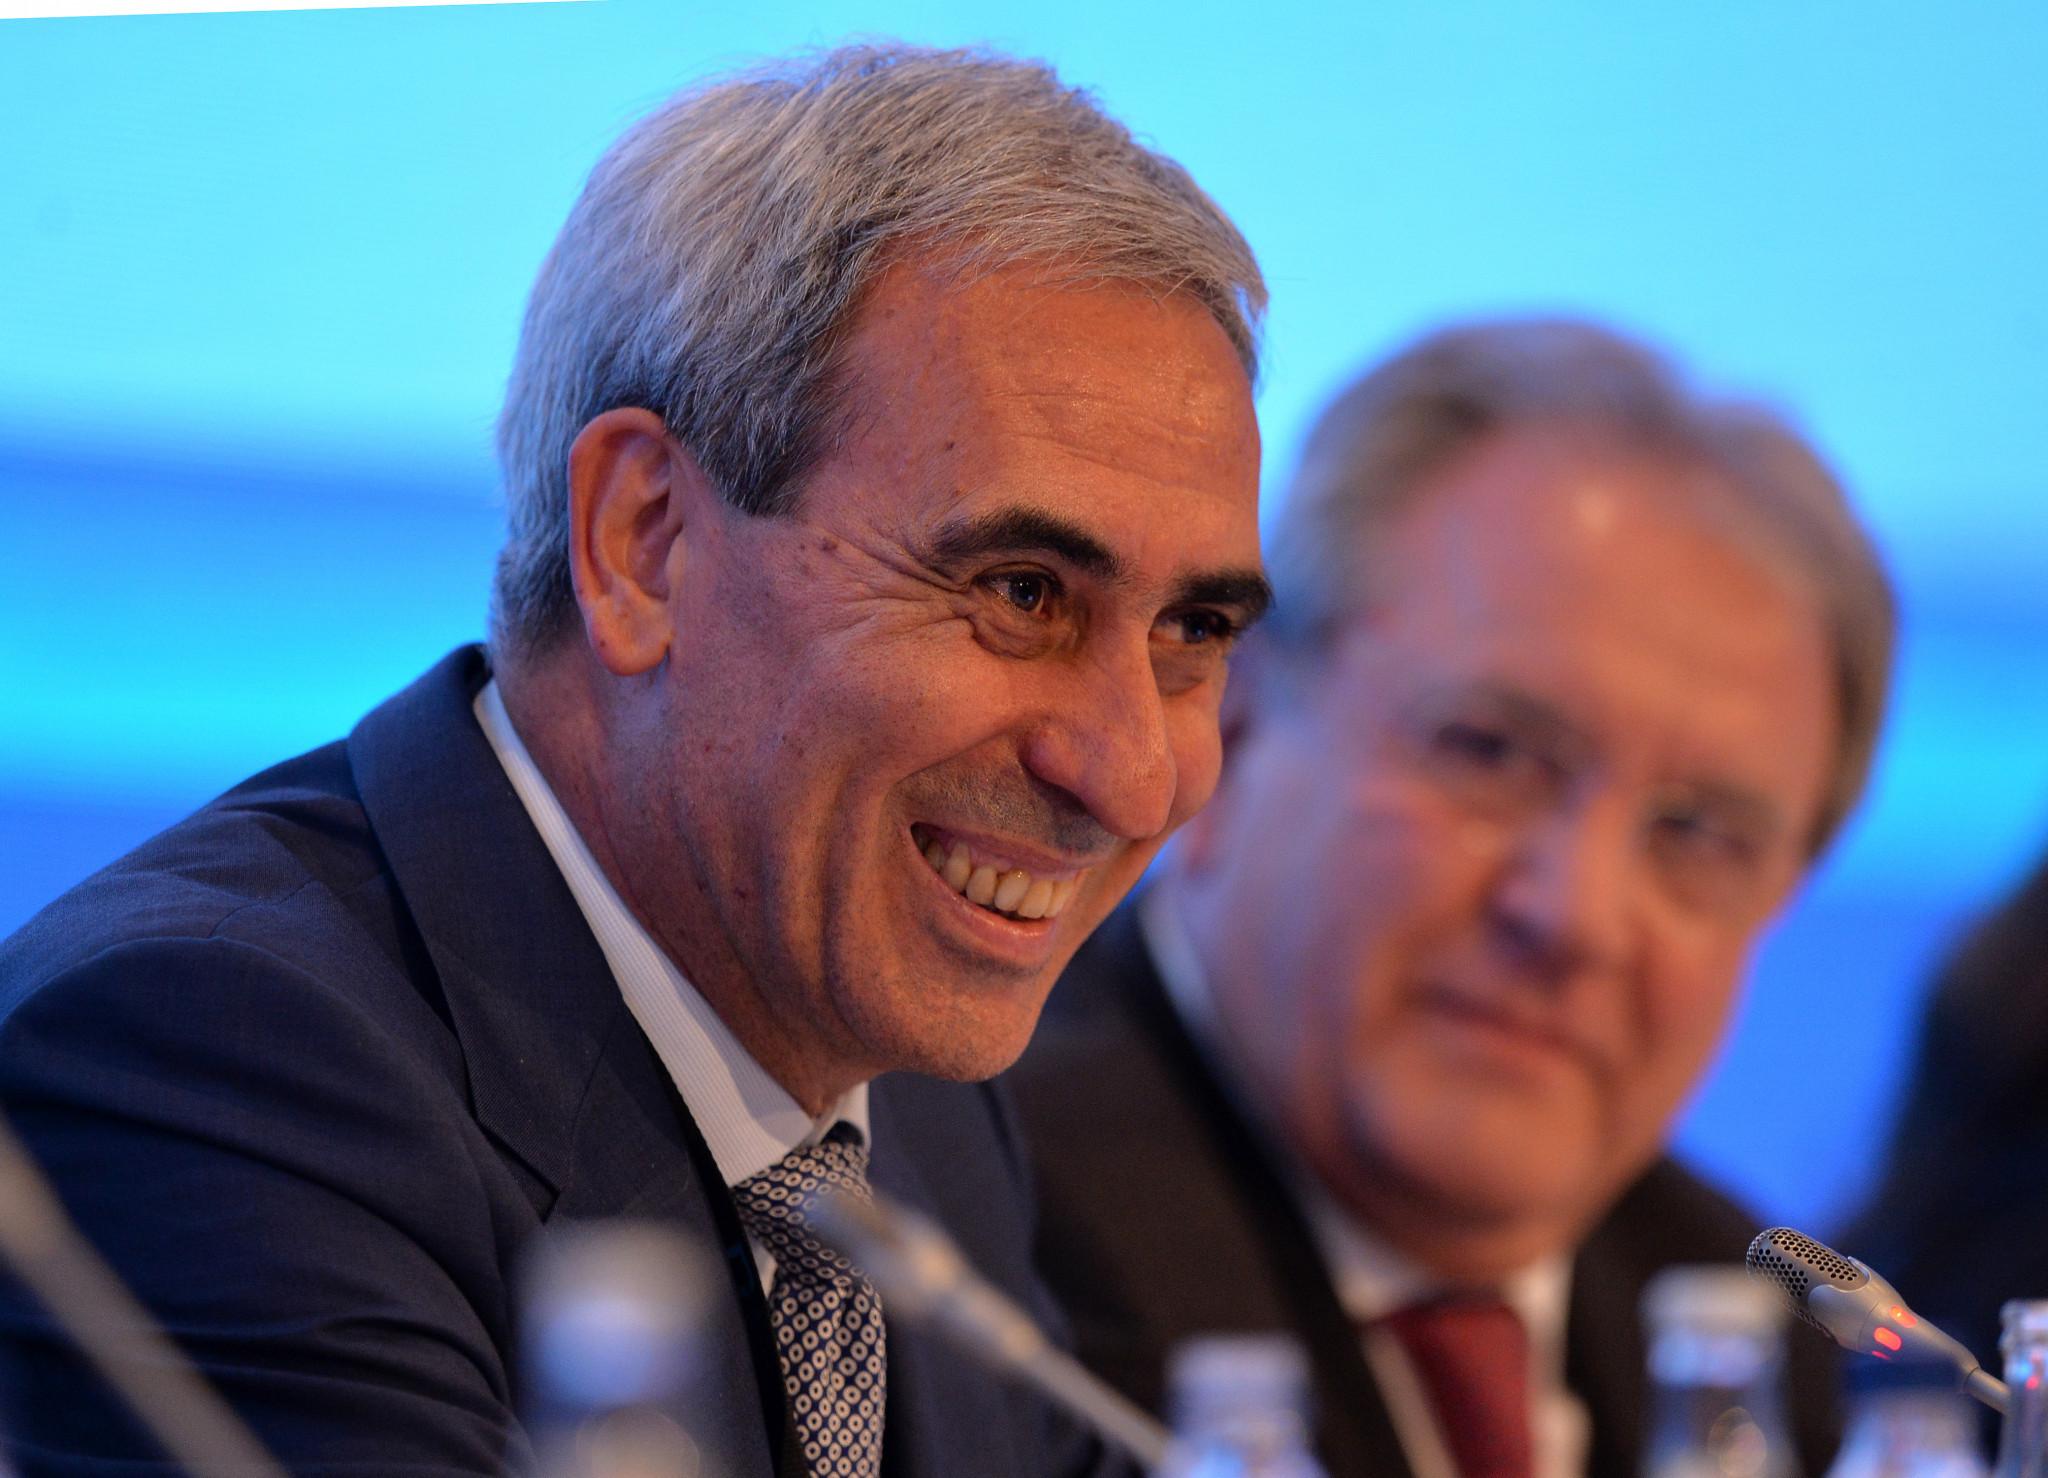 GAISF President Chiulli hails importance of International Day of University Sport